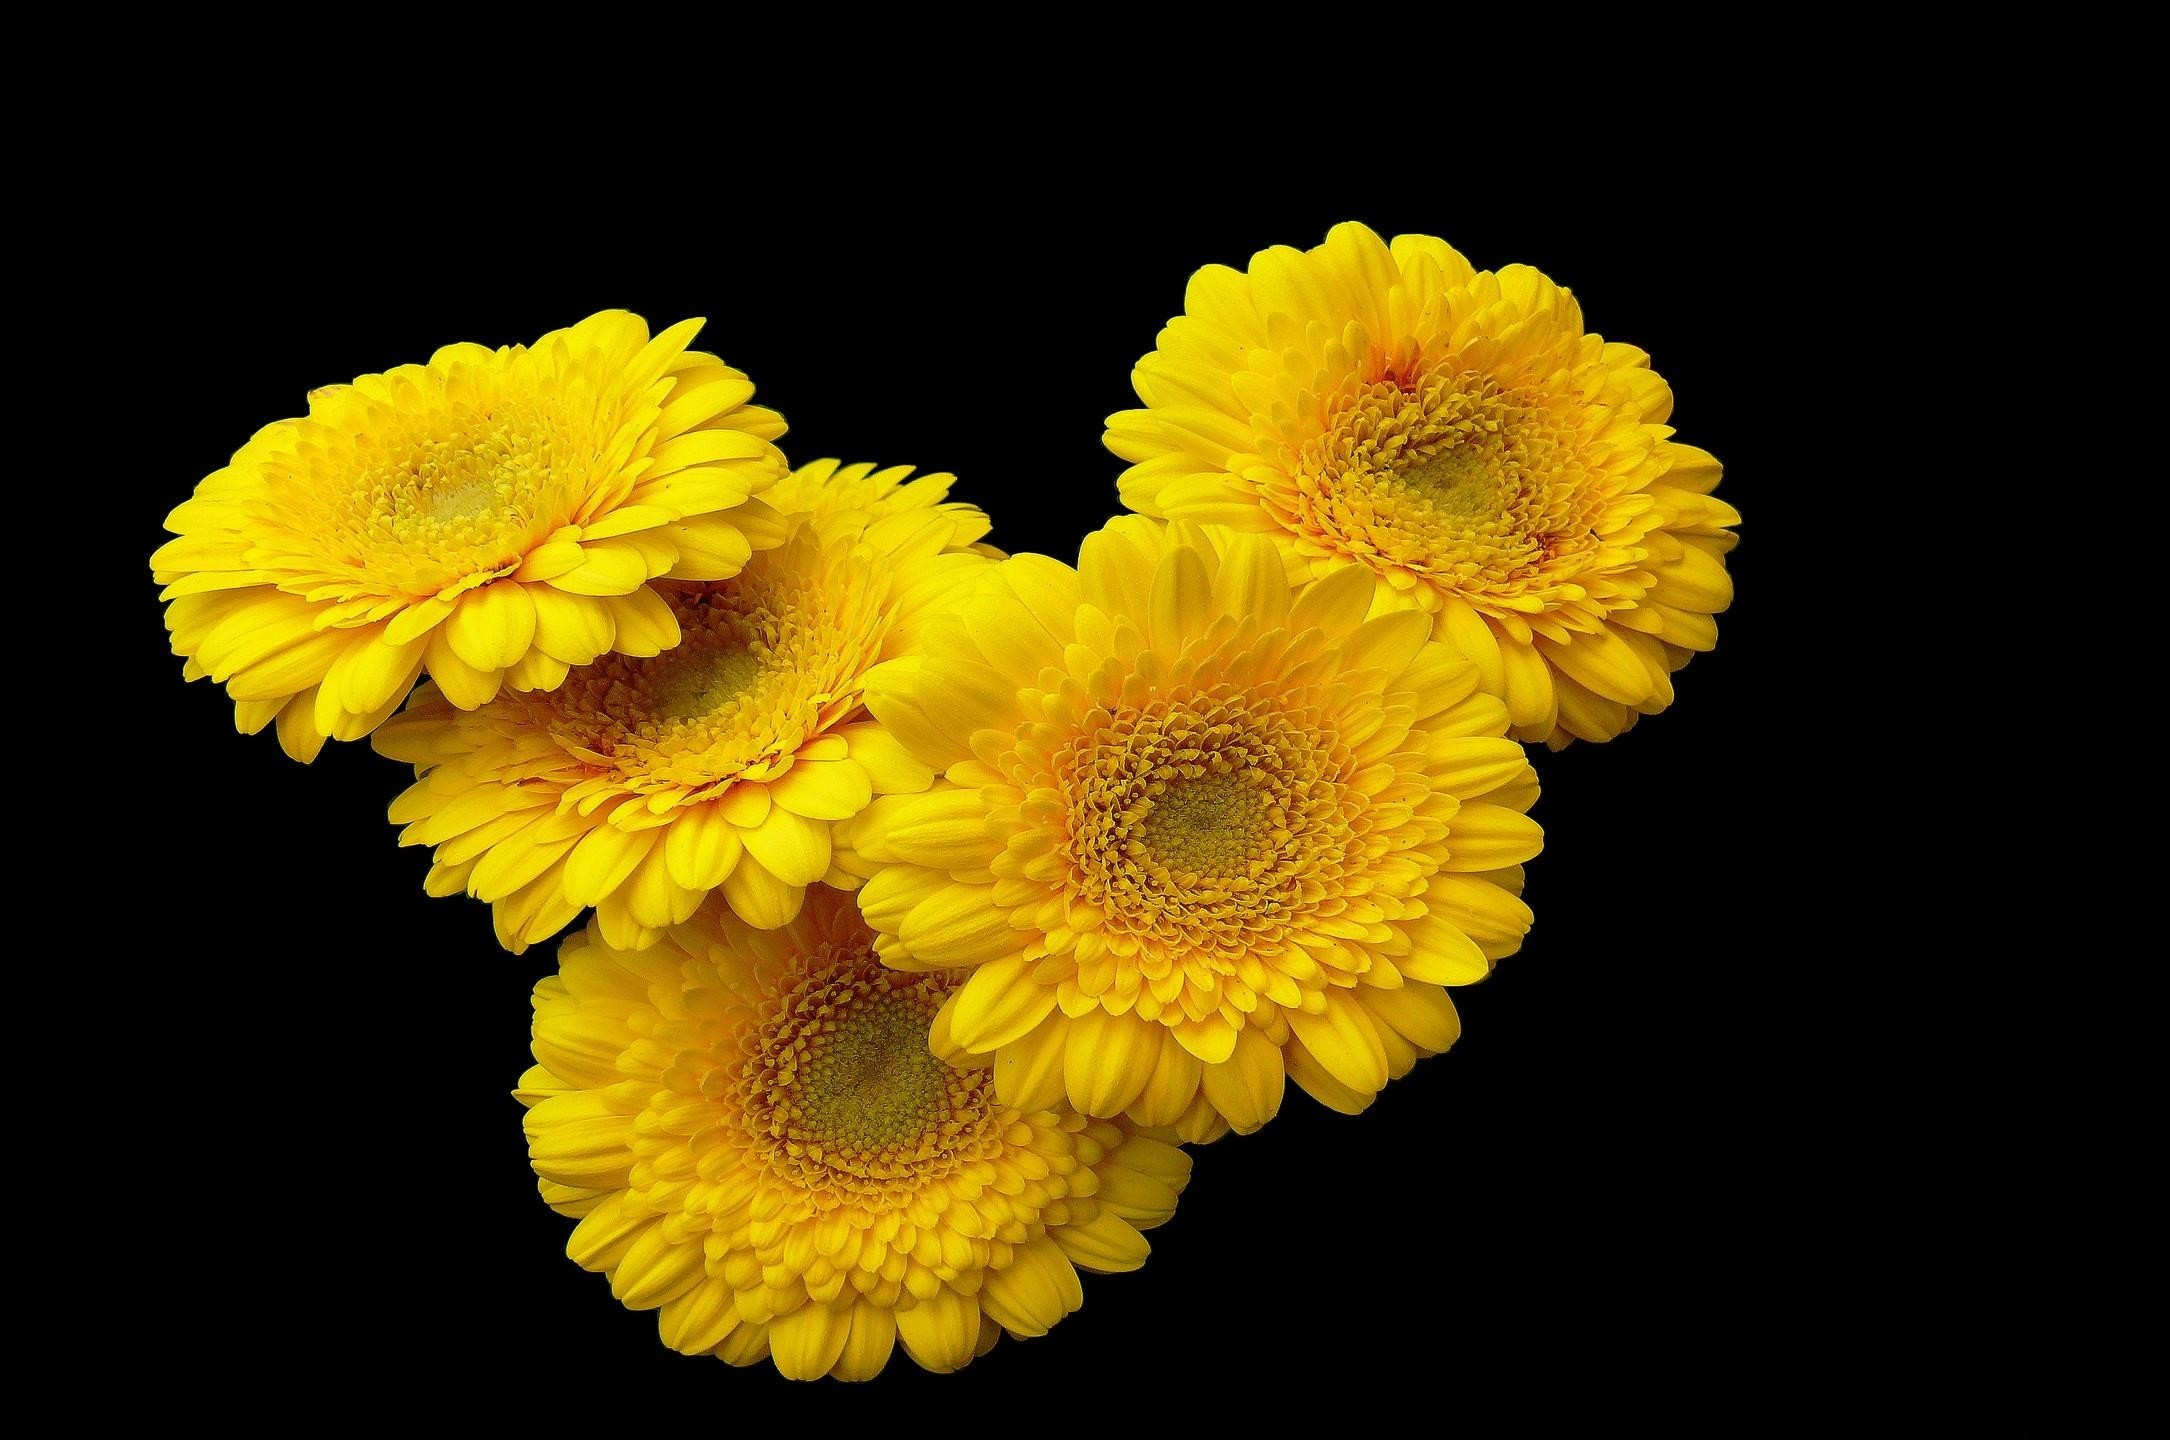 Wallpaper gerbera, flower, yellow, black background